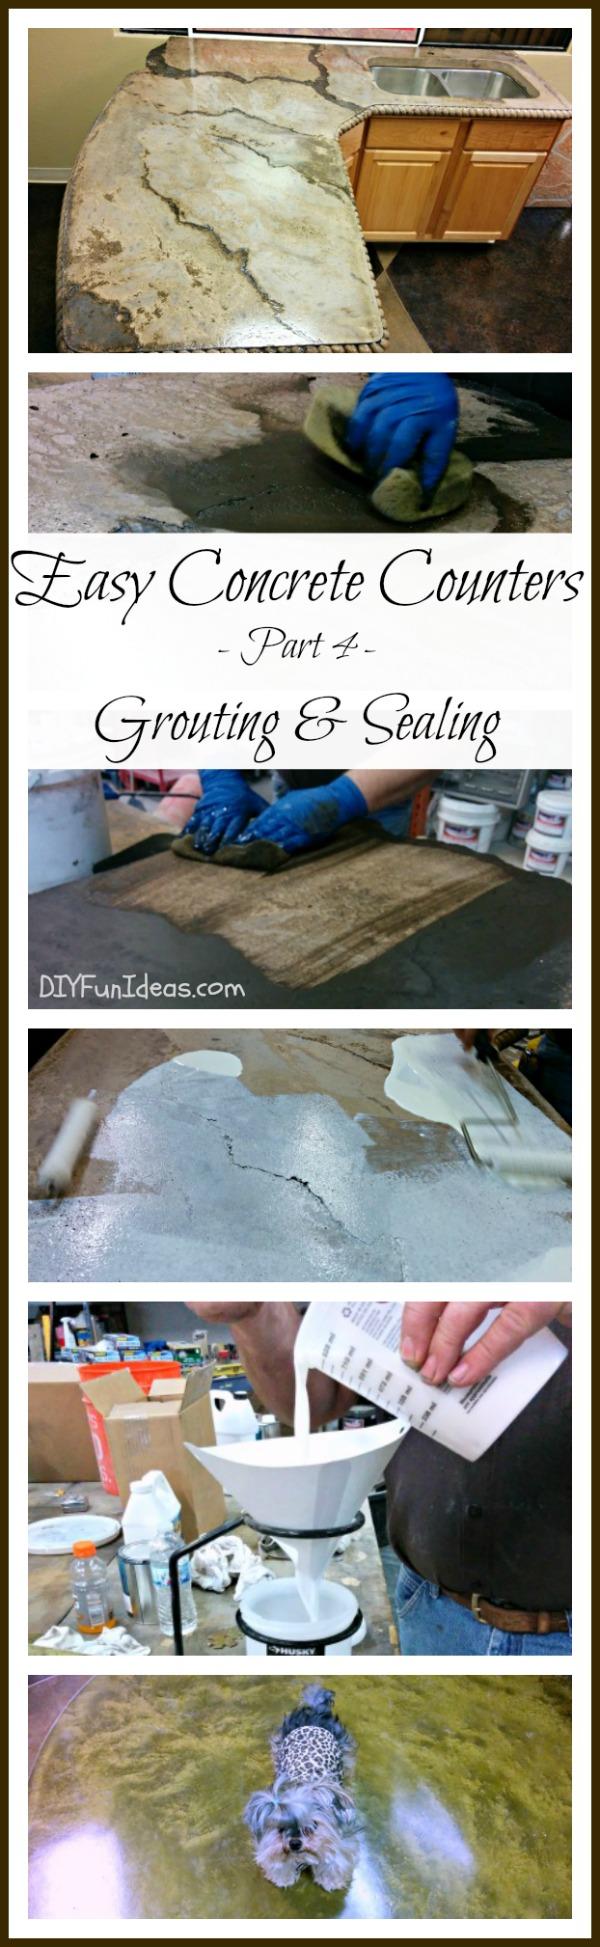 EASY DIY CONCRETE COUNTERTOP TUTORIAL - Part 4 Grouting & Sealing